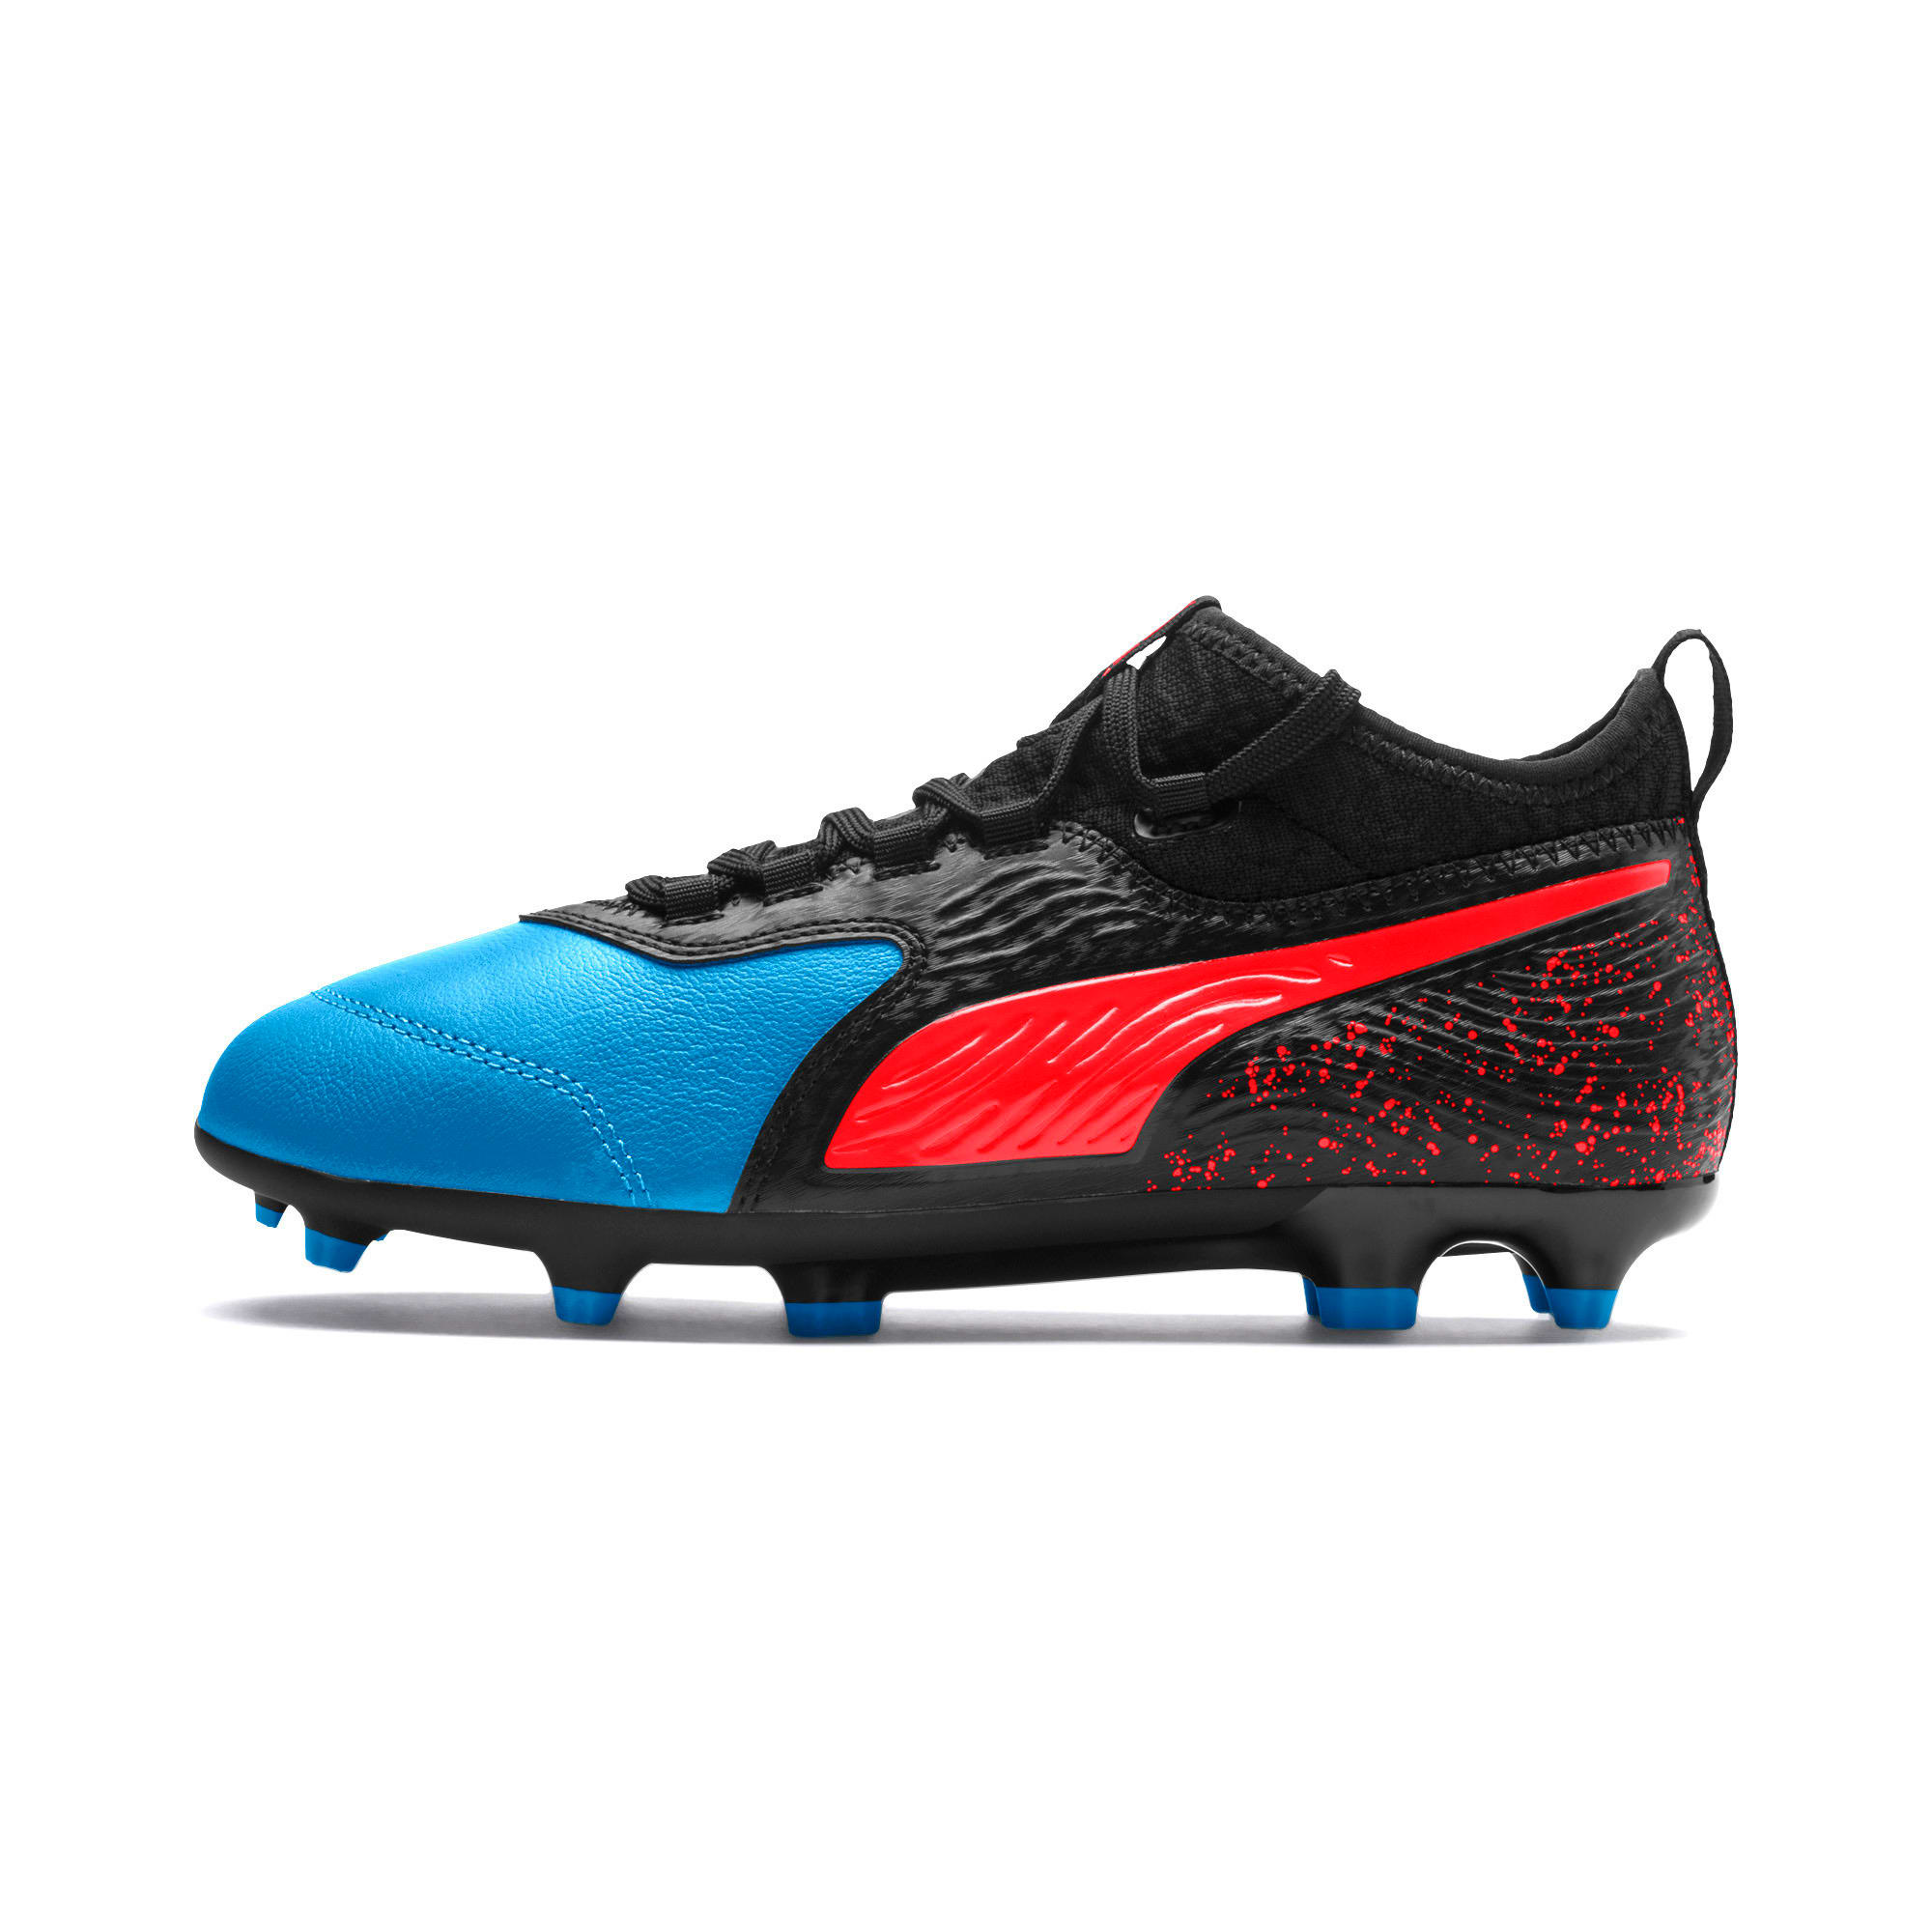 Thumbnail 1 of PUMA ONE 19.3 FG/AG Soccer Cleats JR, Bleu Azur-Red Blast-Black, medium